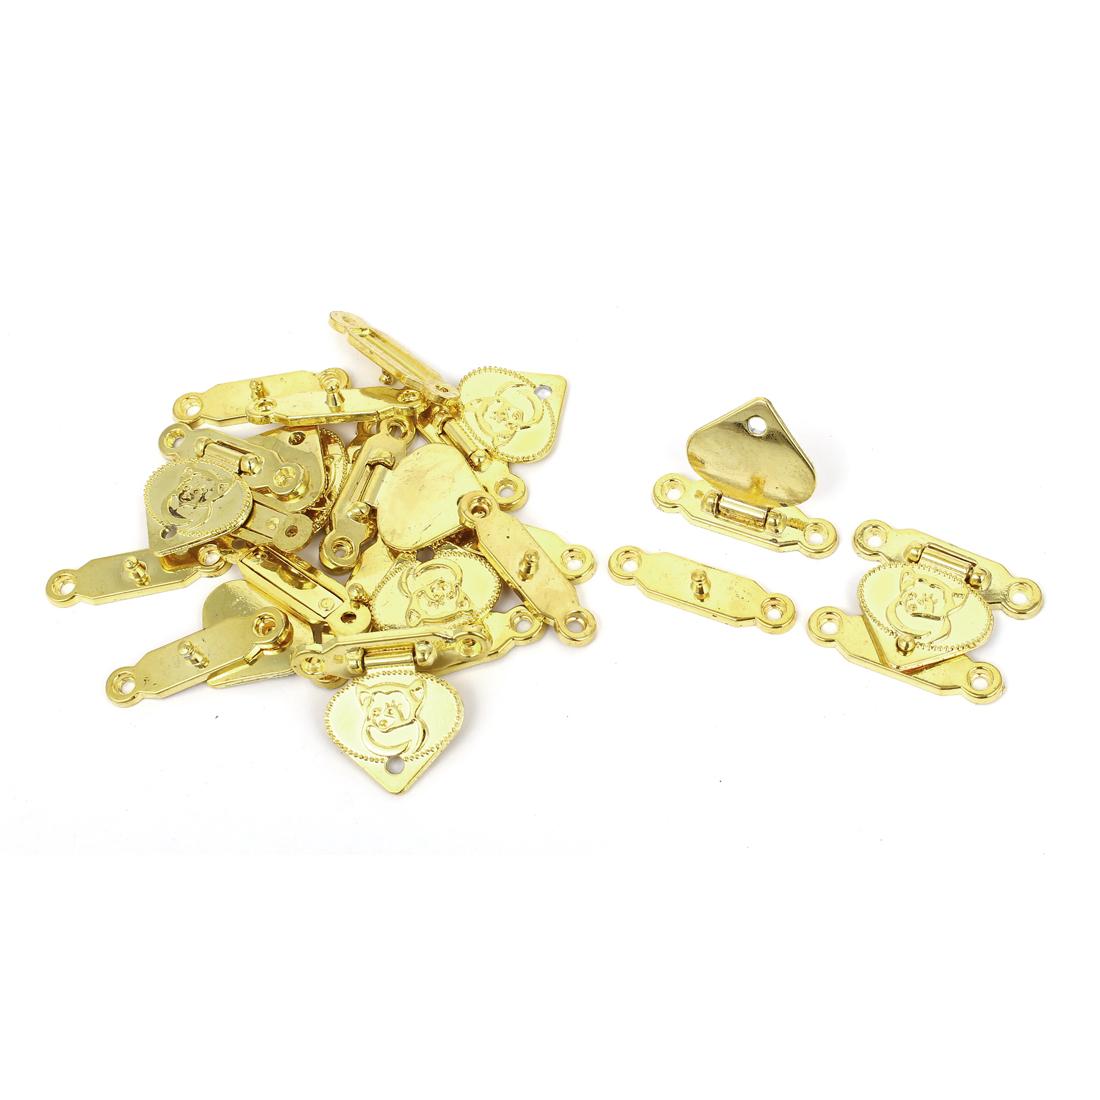 30mm x 38mm Metal Box Drawer Clasp Hasp Hook Lock Lid Latch Gold Tone 10pcs